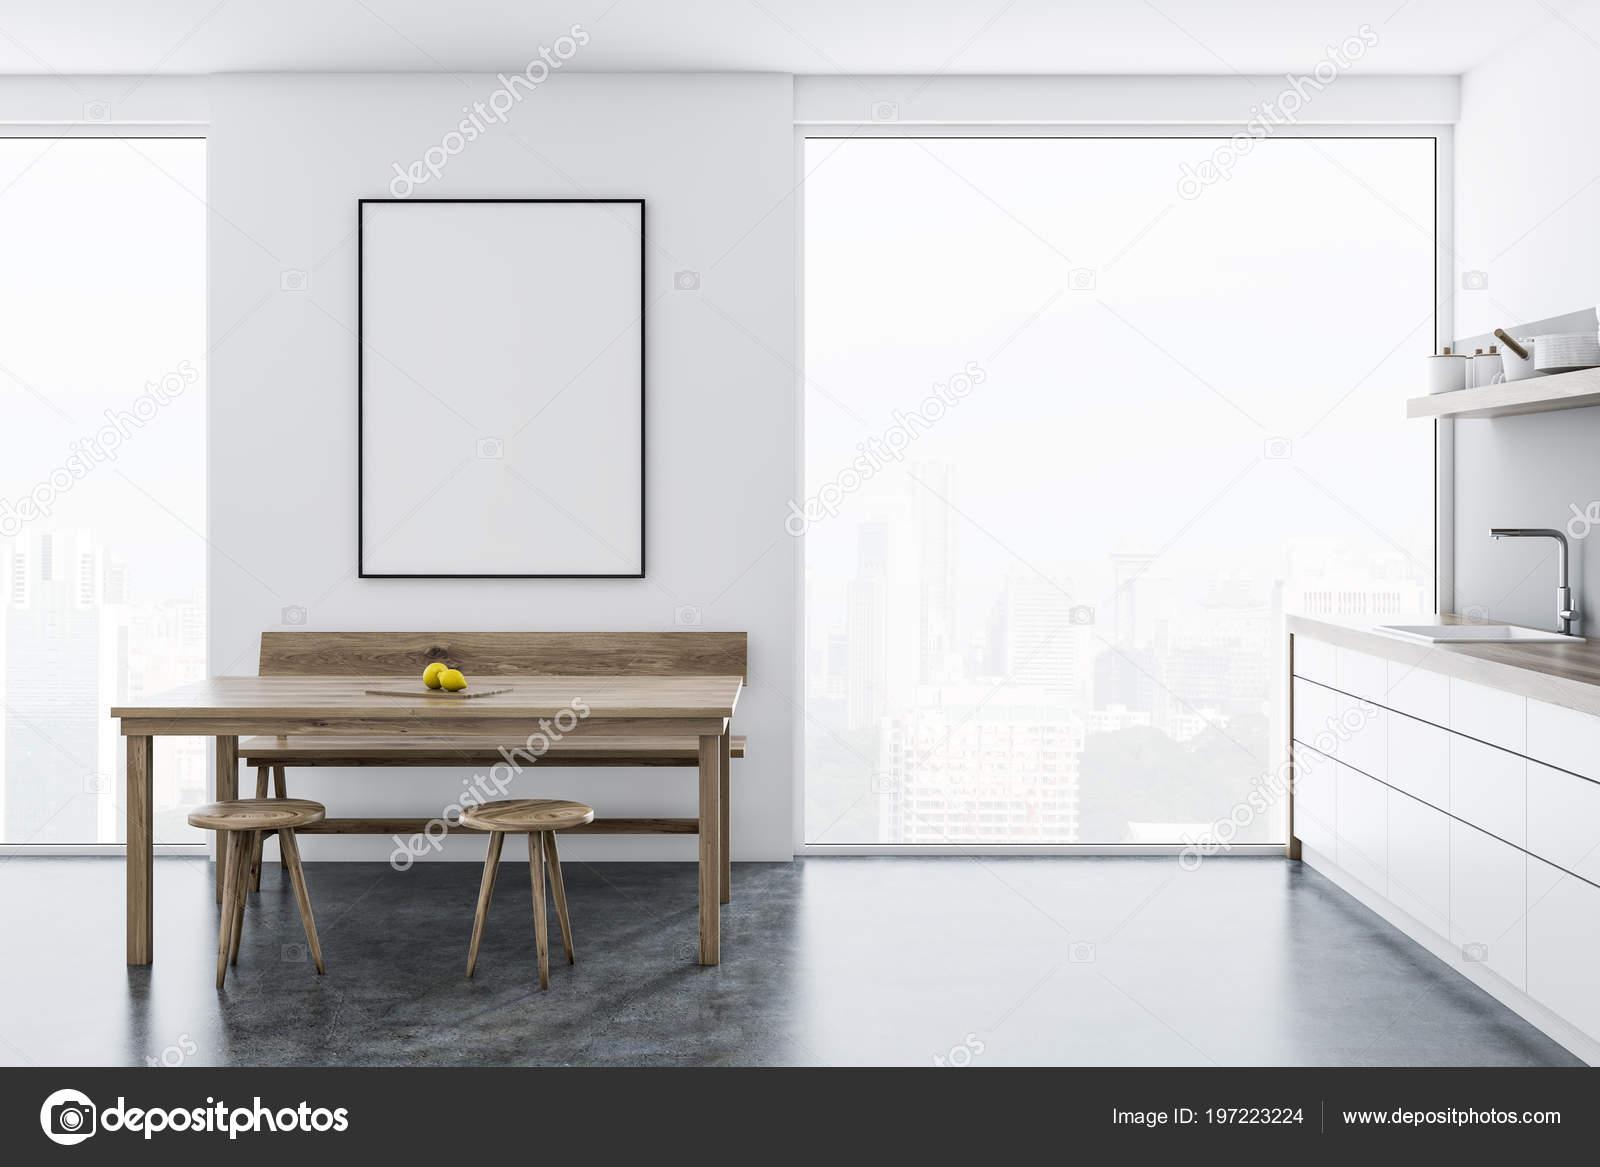 kitchen banquettes for sale kohler undermount sinks 斯堪的纳维亚风格的餐厅和厨房角落与全景窗口一张桌子木椅和长凳附近和 斯堪的纳维亚风格的餐厅和厨房角落与全景窗口 一张桌子 木椅和长凳附近和台面 城市风景 3d 渲染样板架海报